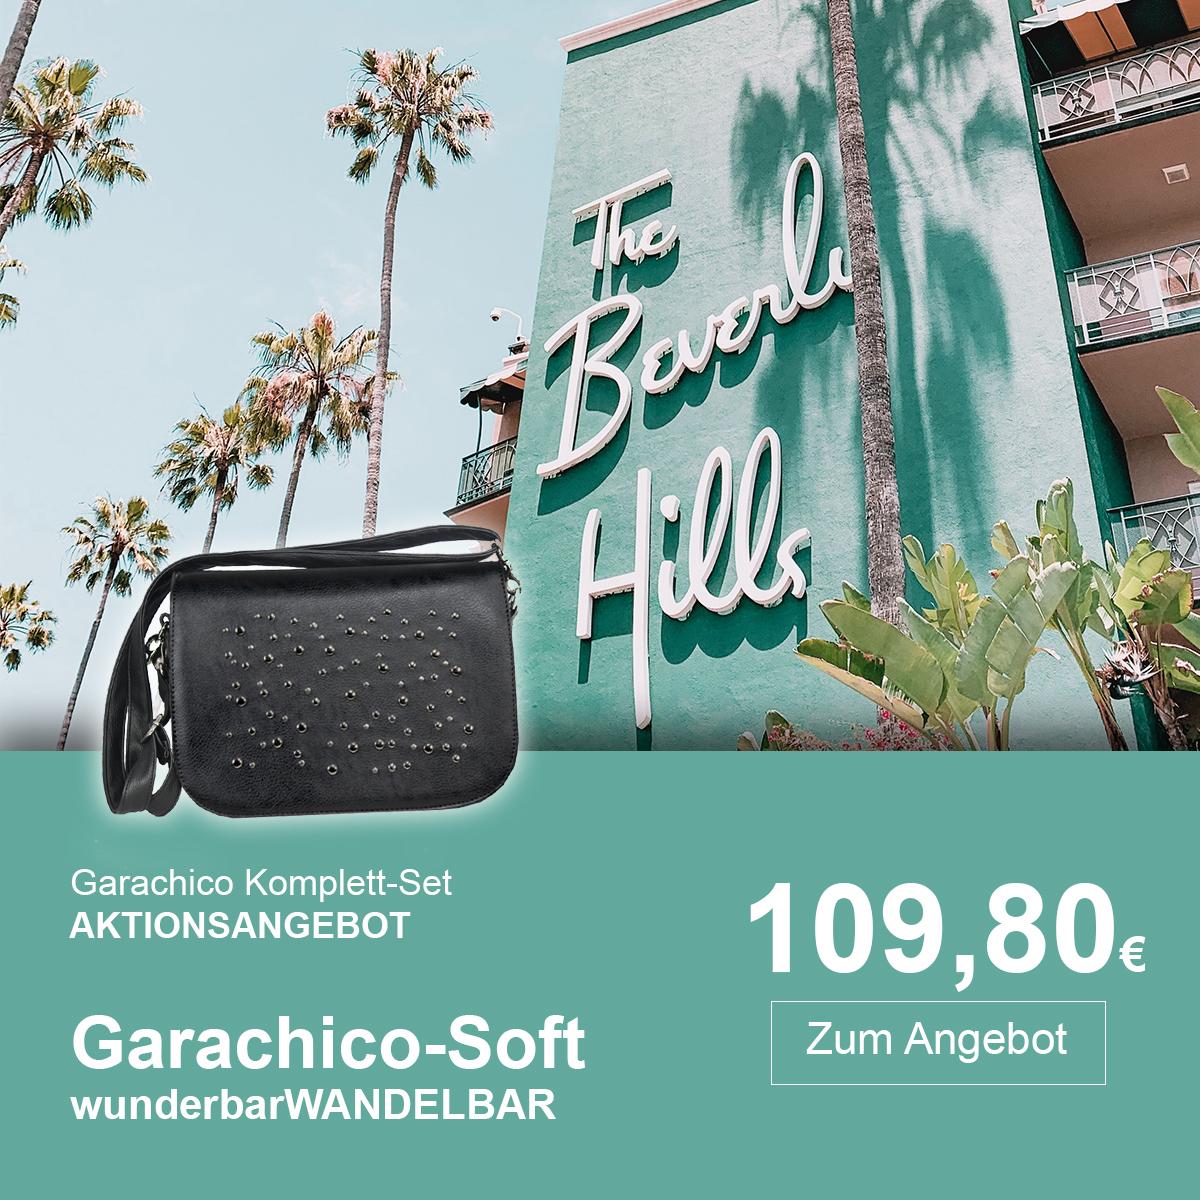 Angebot Soft Bag Garachico Komplett Set Handtasche